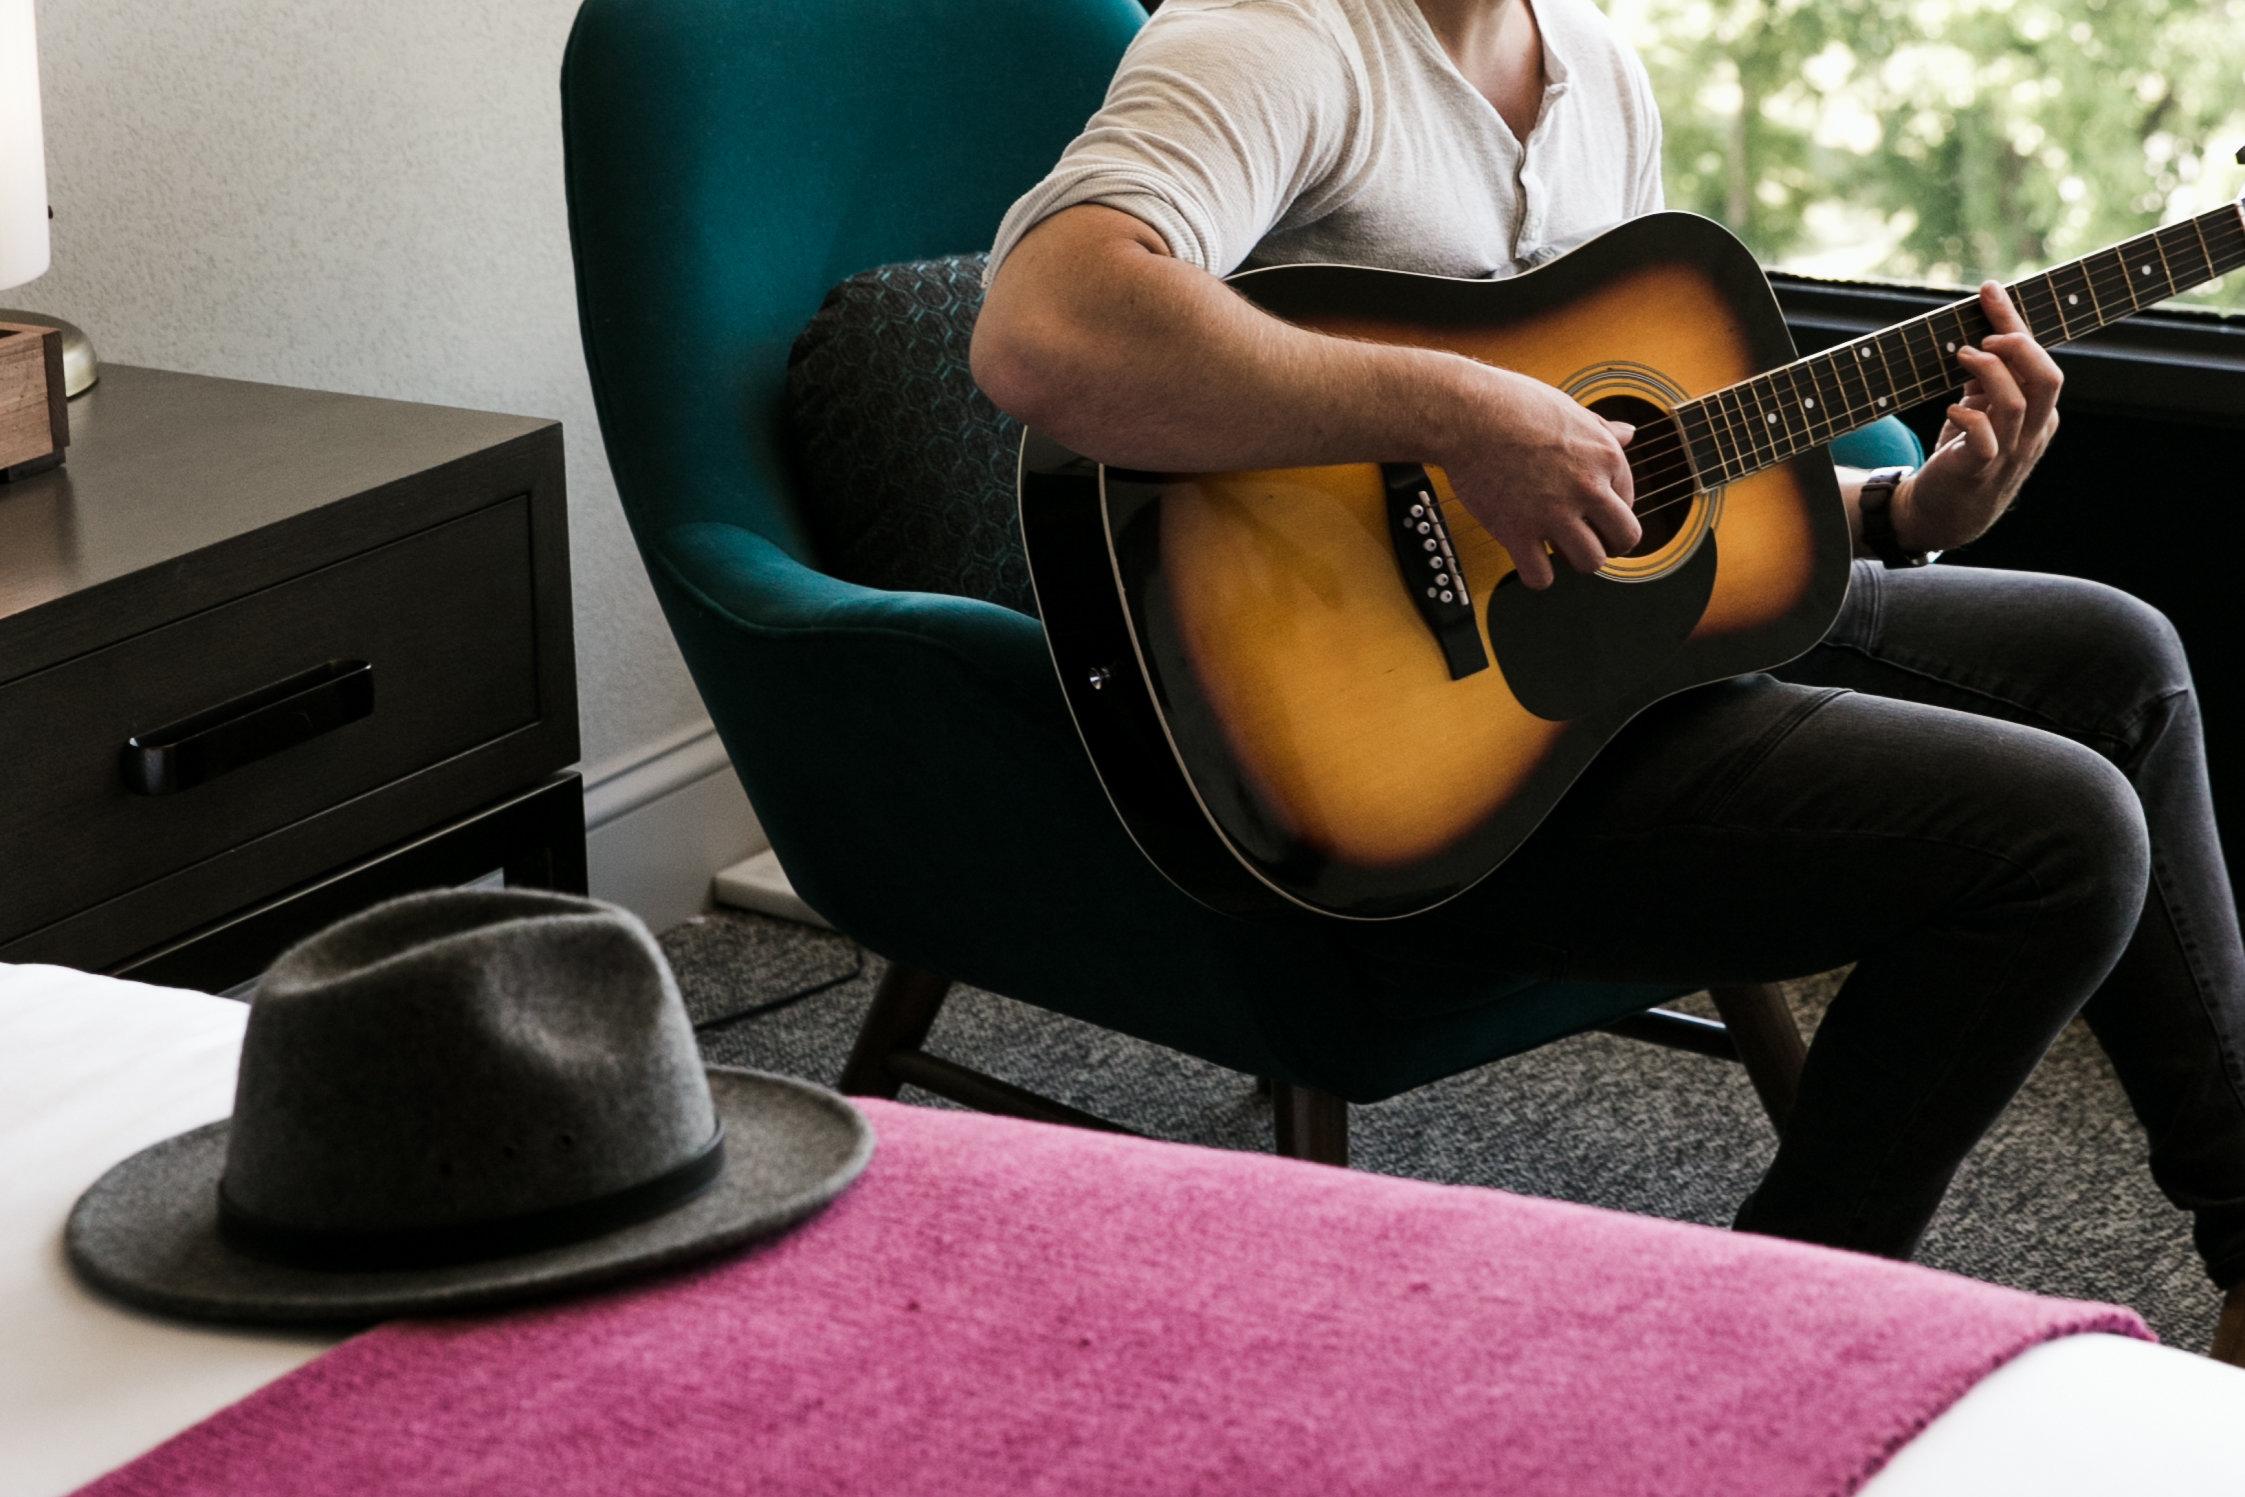 Hotel-Preston-guitar-Nashville.jpg?mtime=20190501142129#asset:105680